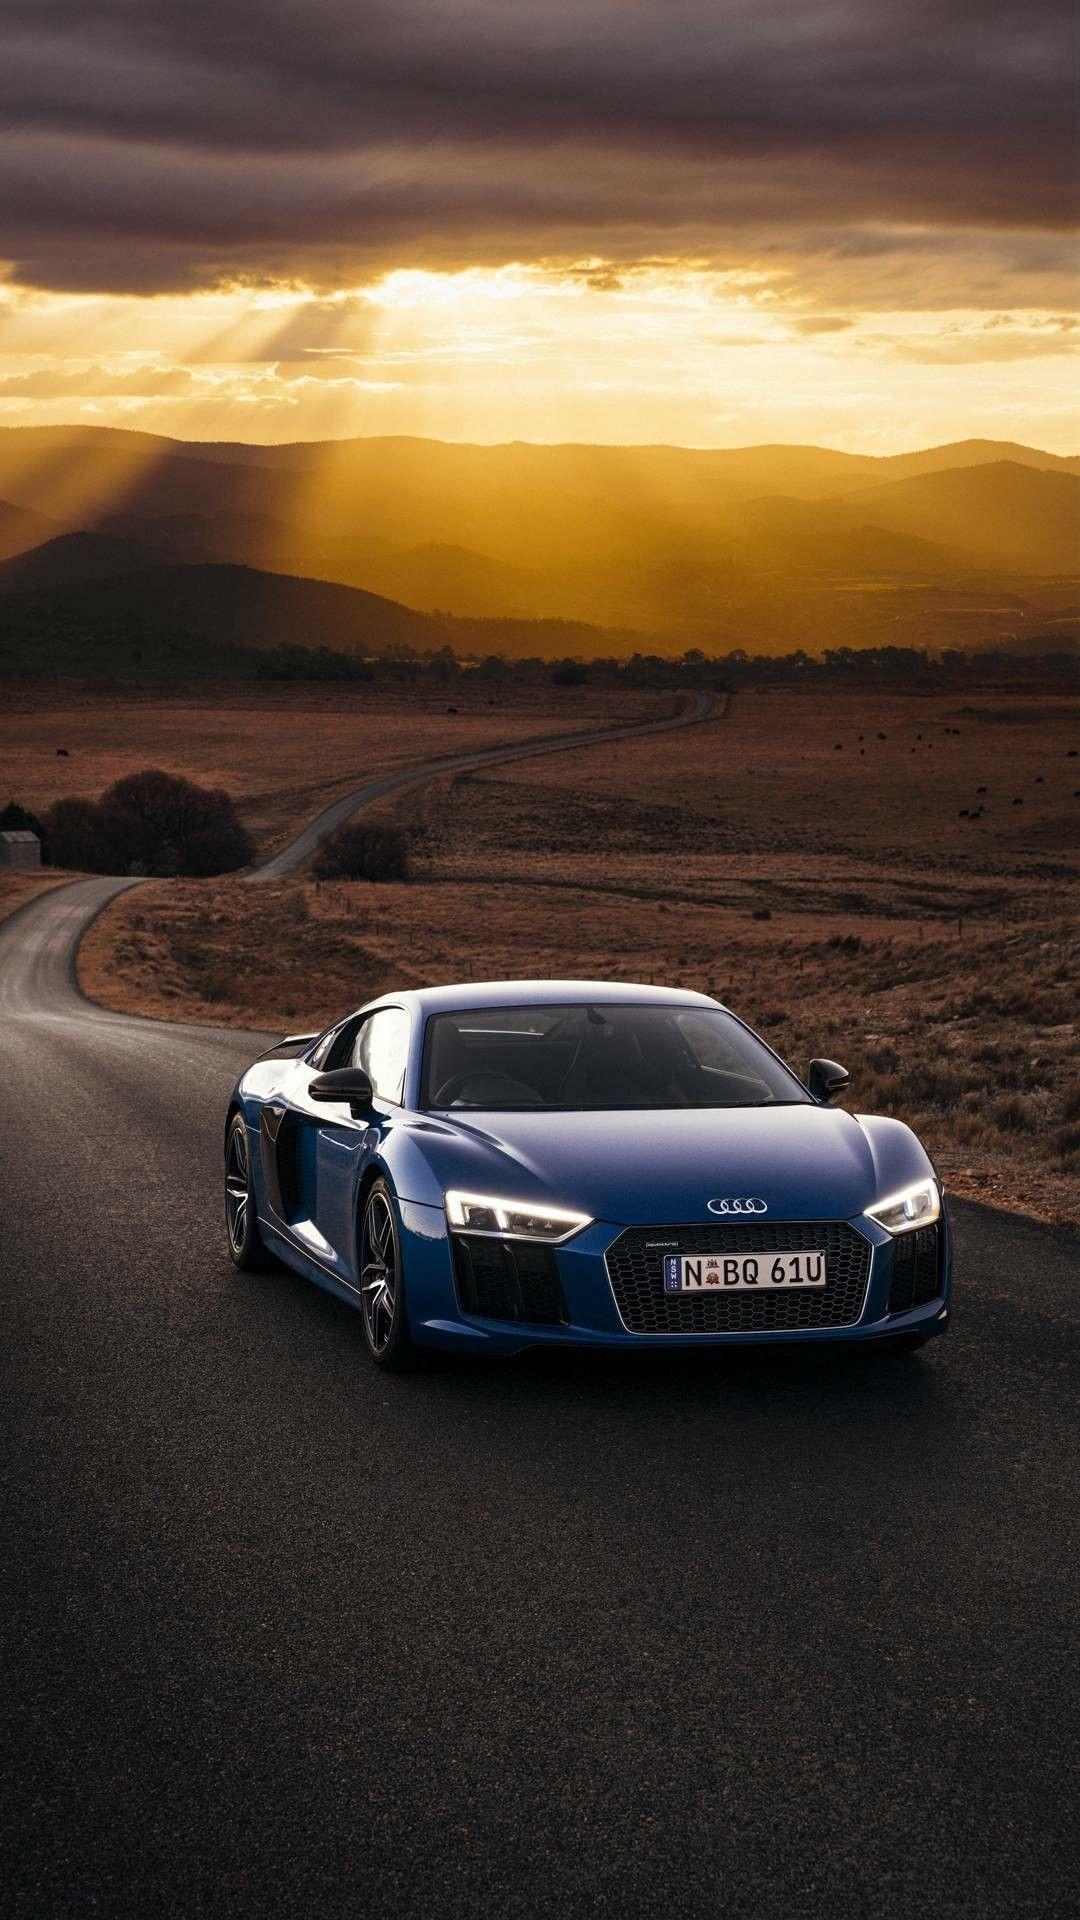 Audi R8 V10 -ℛℰ℘i ℕnℰD by Averson Automotive Group LLC #audir8 Audi R8 V10 -ℛℰ℘i ℕnℰD by Averson Automotive Group LLC #audir8